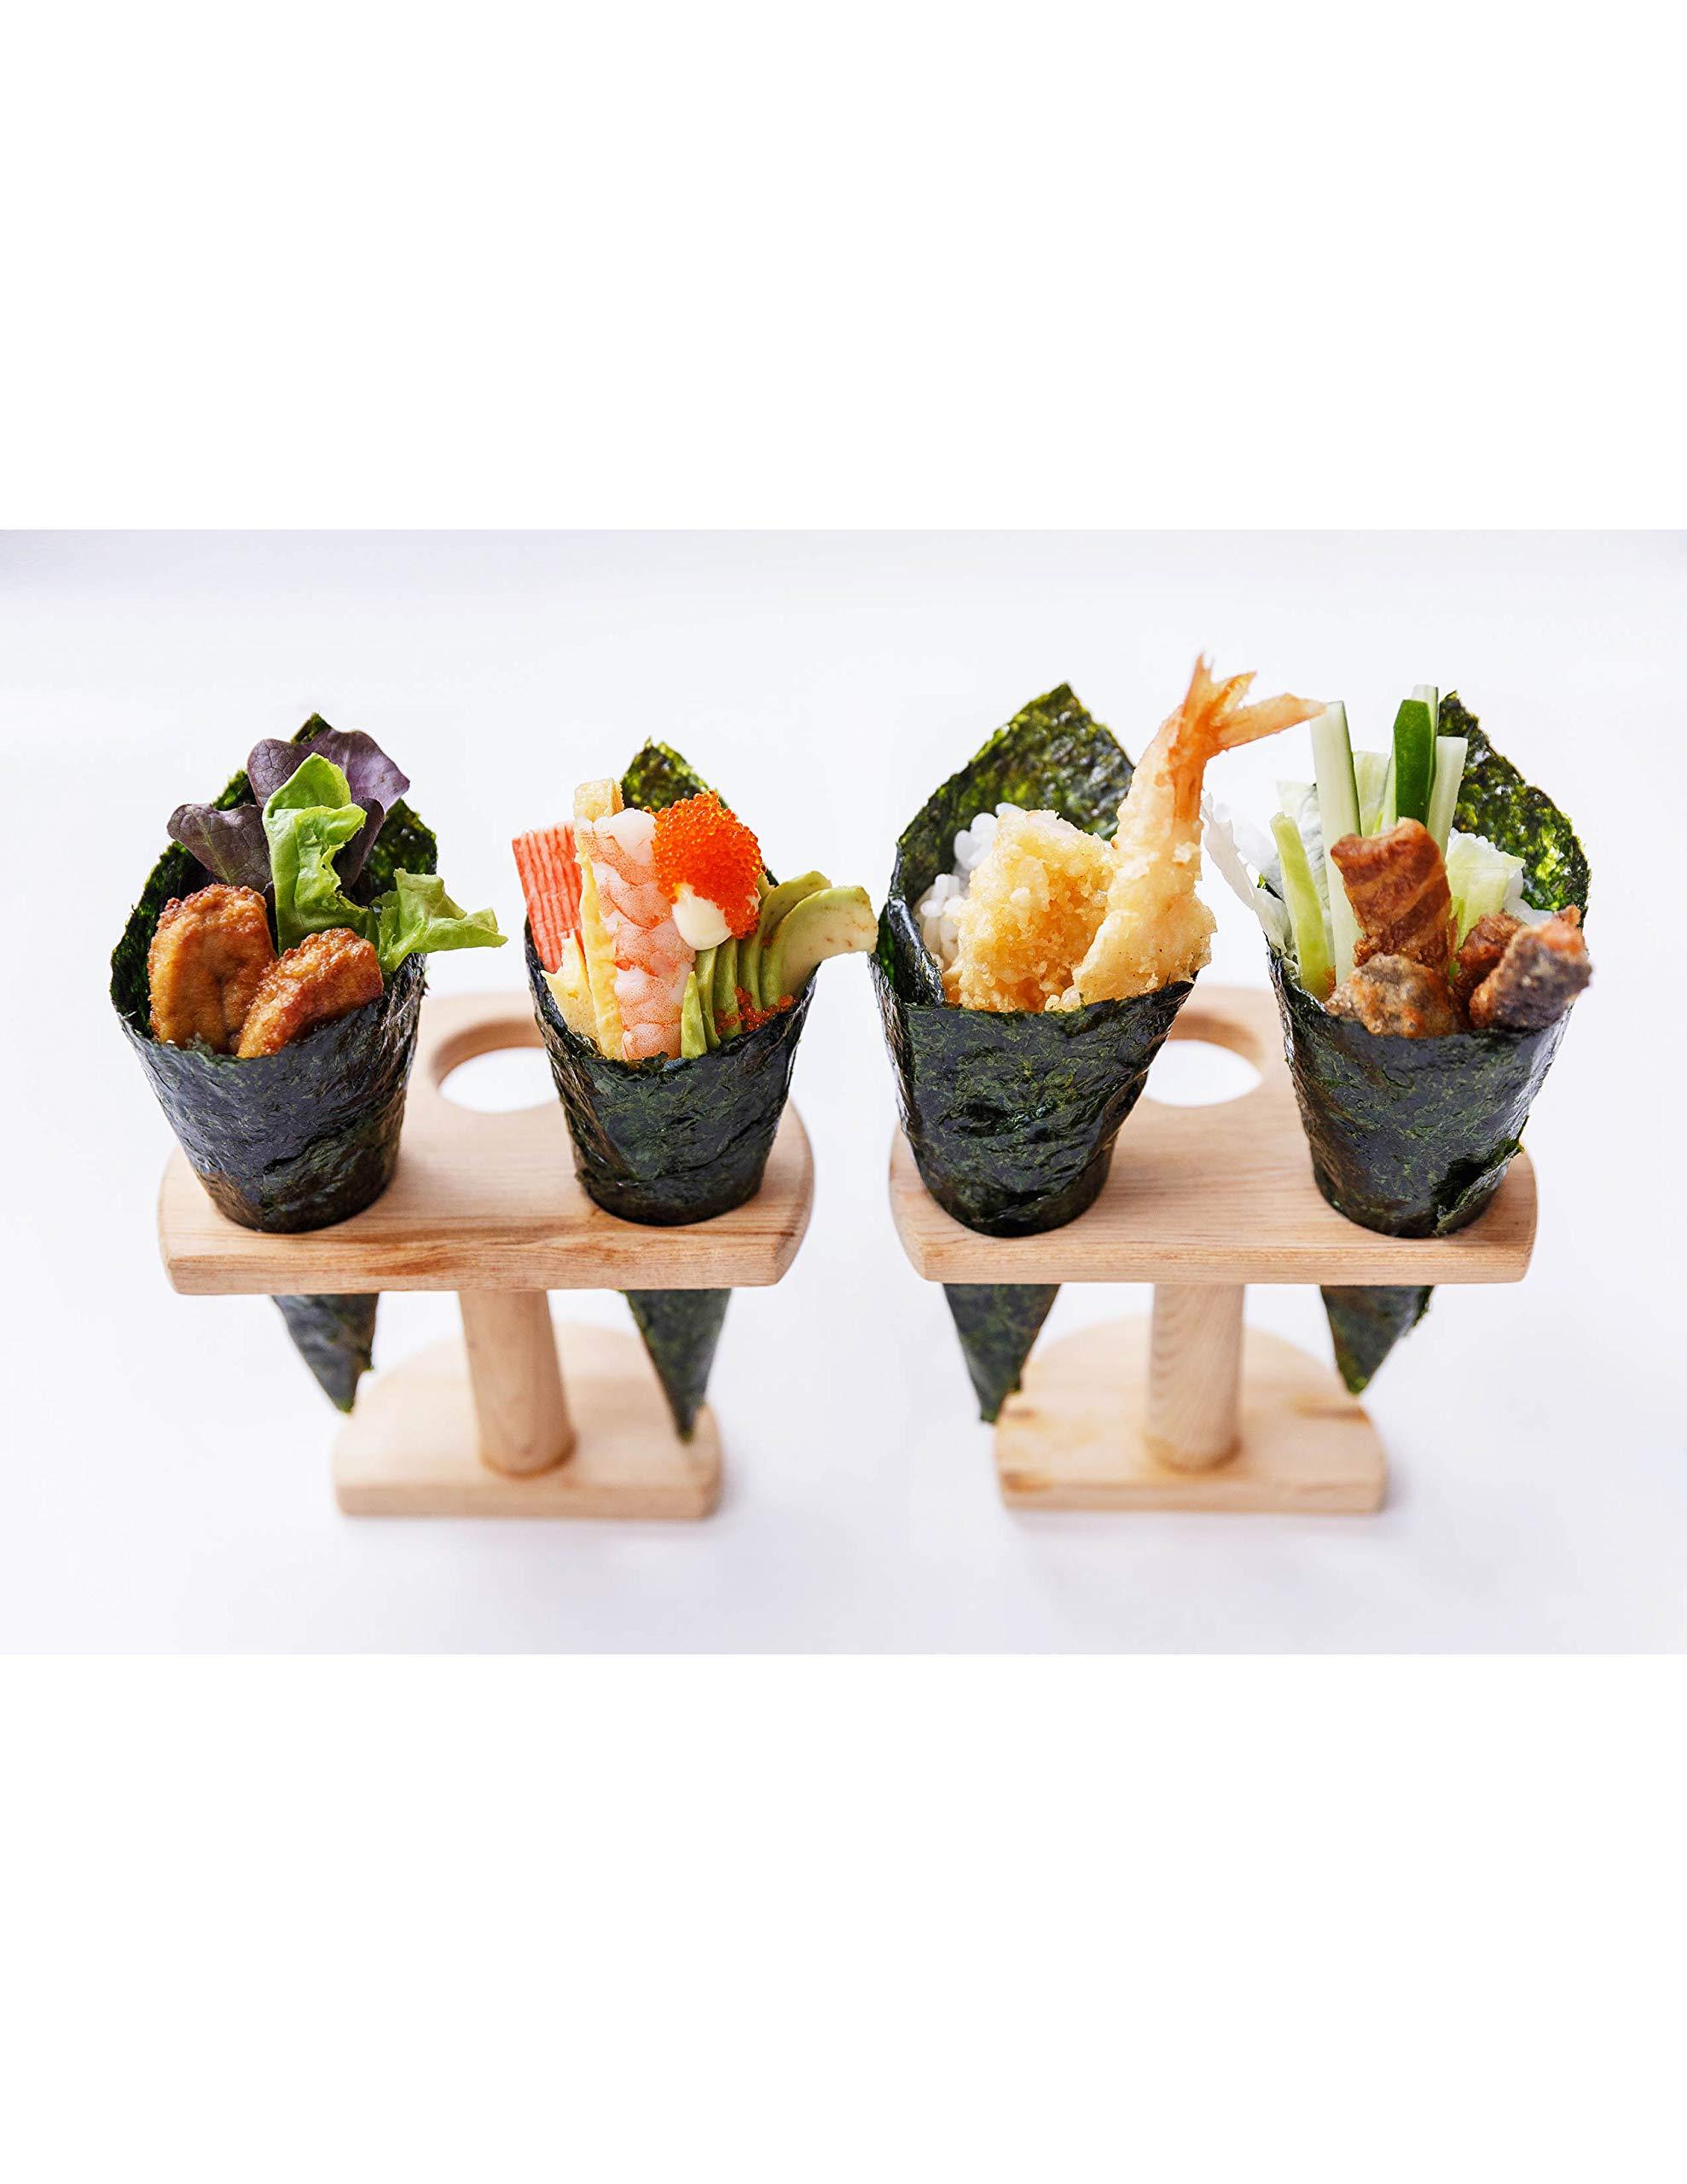 YM Korean Roasted Seaweed Premium Sushi Nori   Premium Gold Grade   Twice Roasted   100% Natural Korean Seaweed   100 Half Sheets (1 Pack) by YM (Image #4)